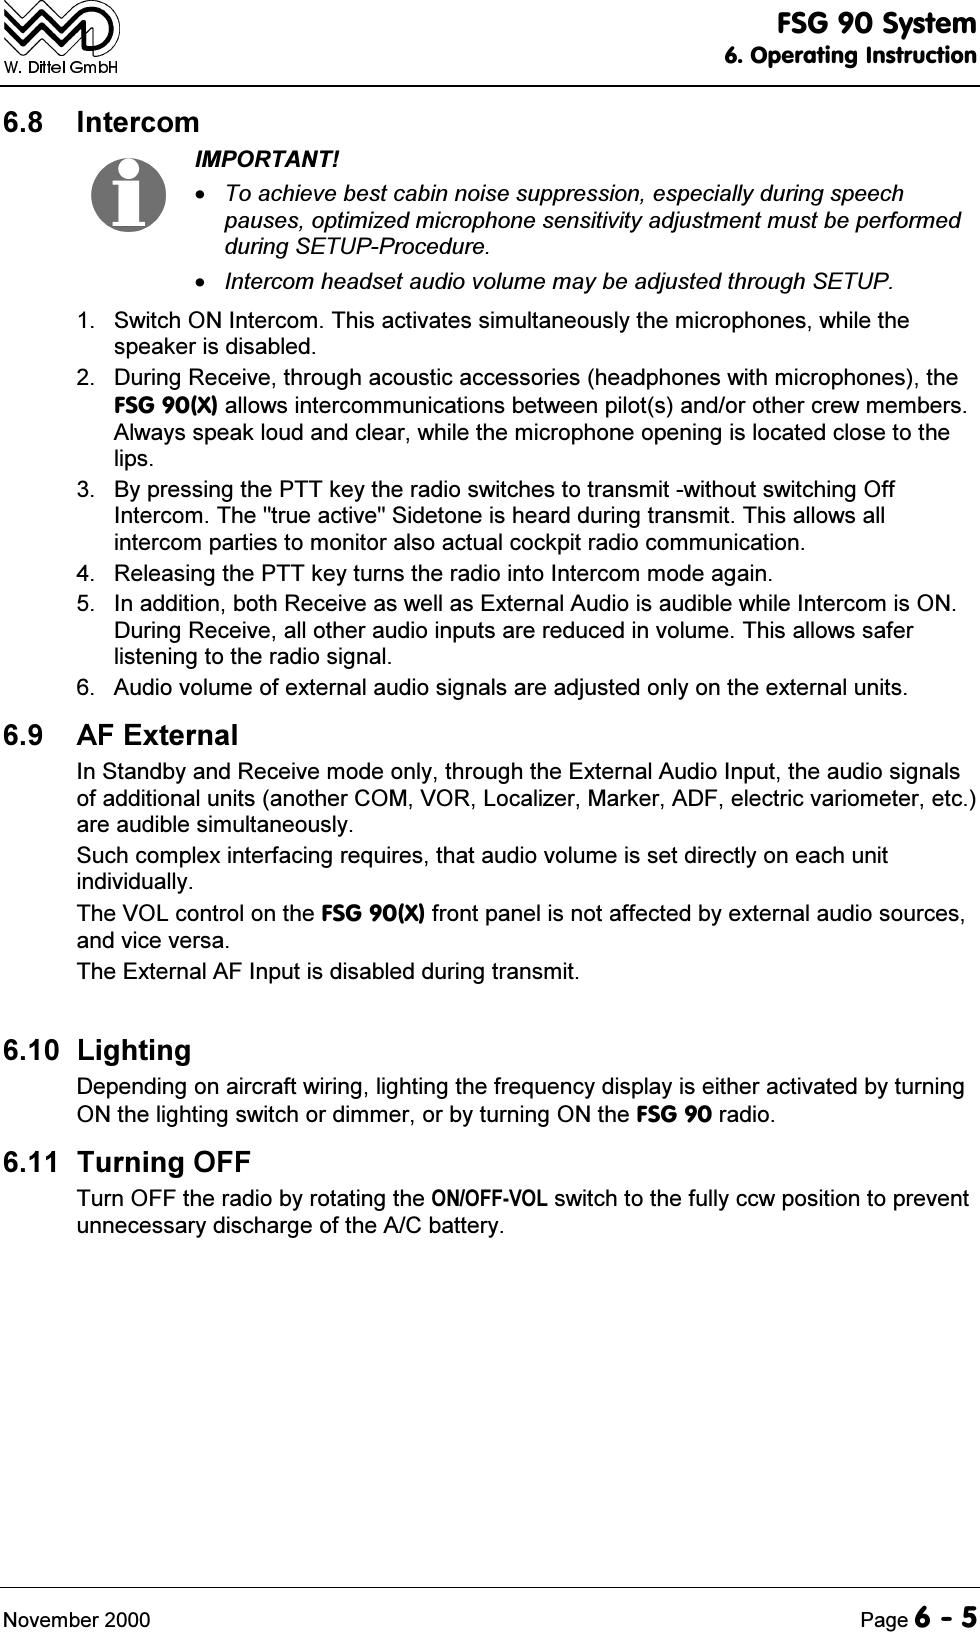 F U N K E Avionics Fsg90 Vhf Am Aviation Analogue Voice Comm Intercom Wiring Diagram Of Unit 10 66vwhp2shudwlqj